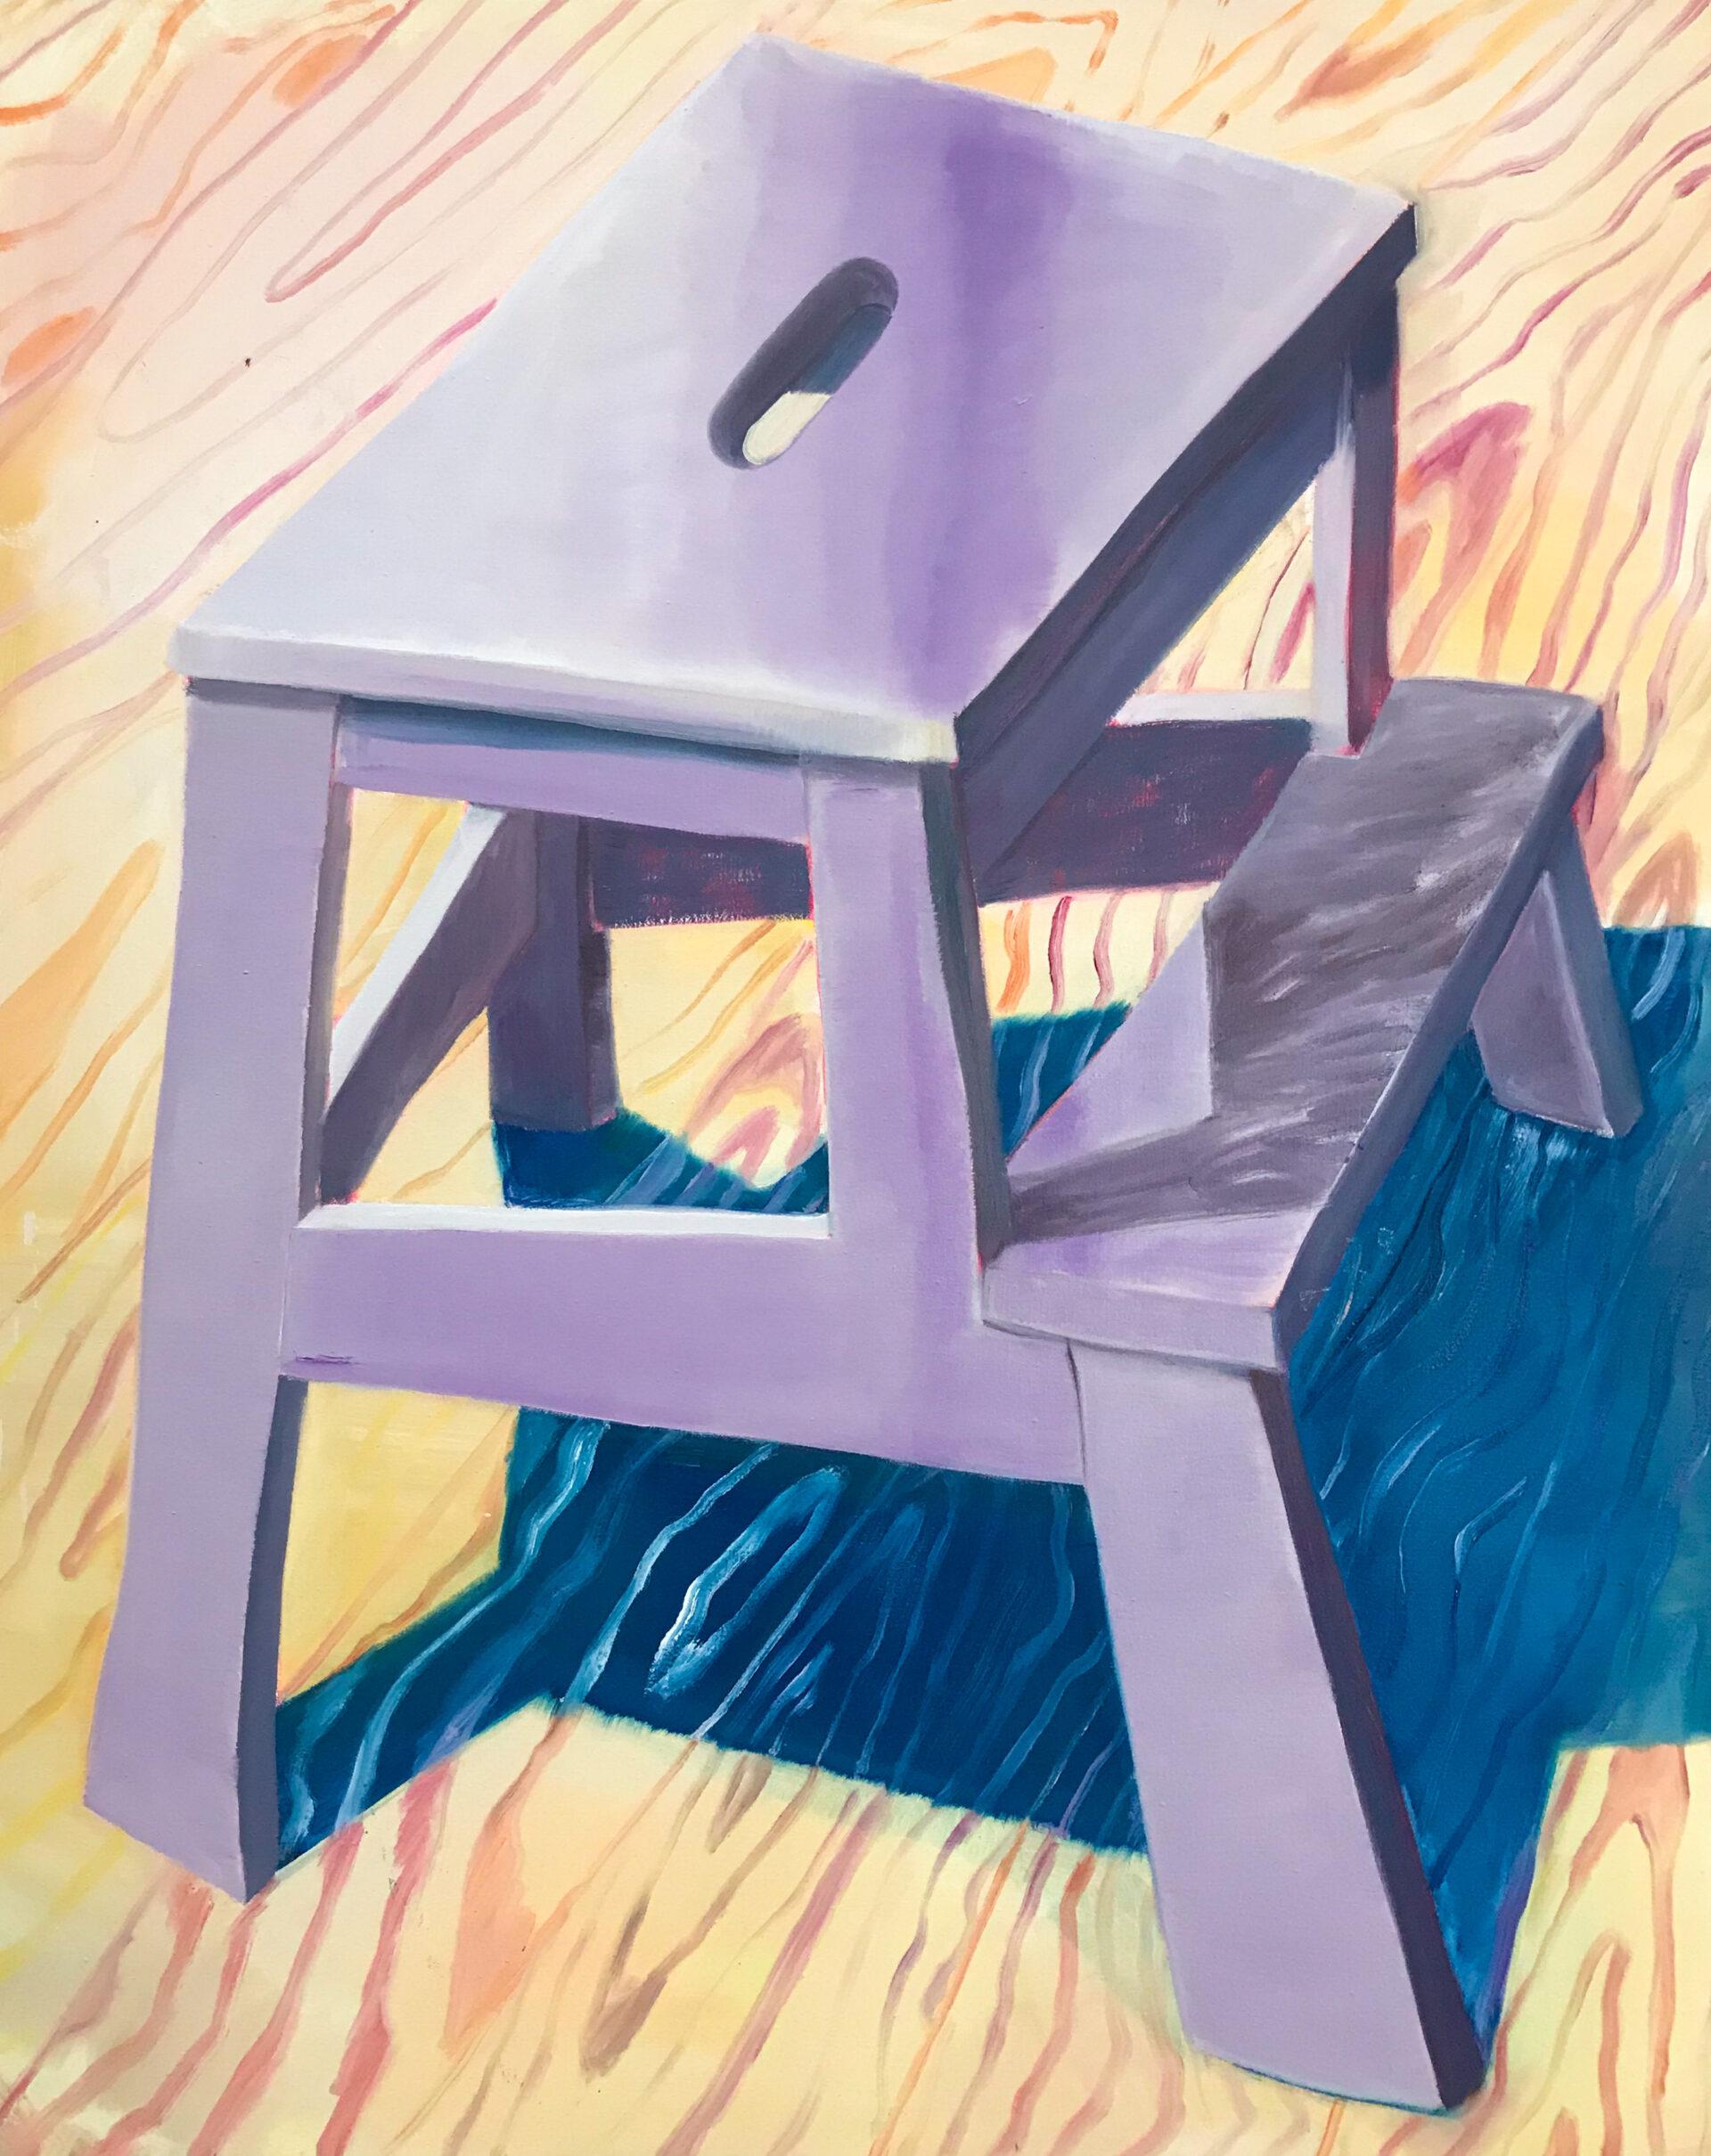 New Friends (Bergfuchs), 2020, oil on canvas, 100 x 80 cm Lisa Breyer